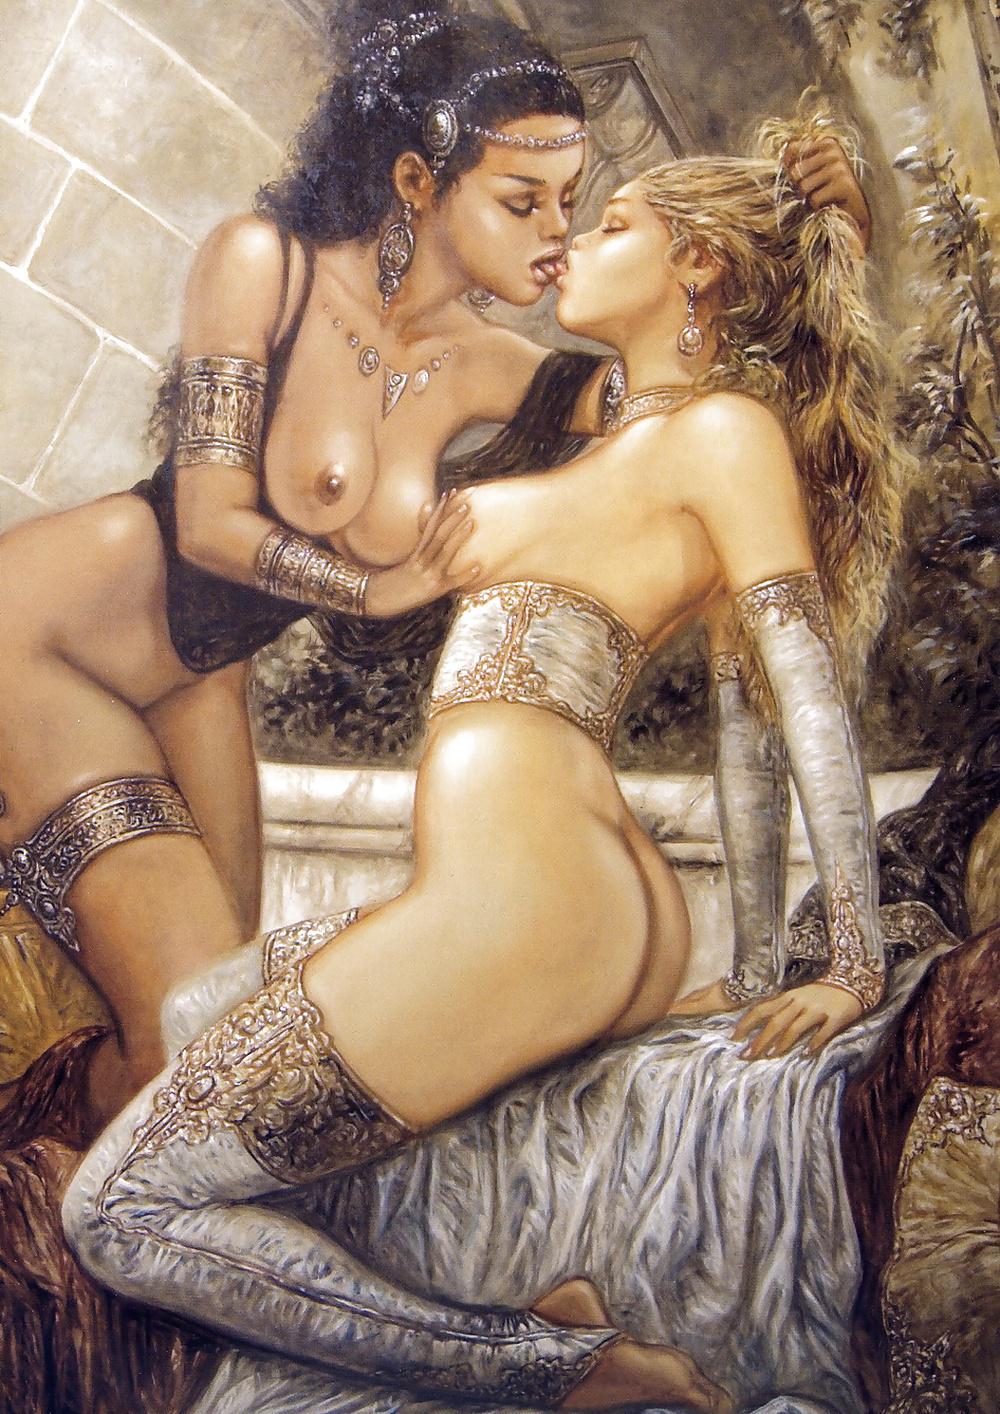 Erotic Sexual Art